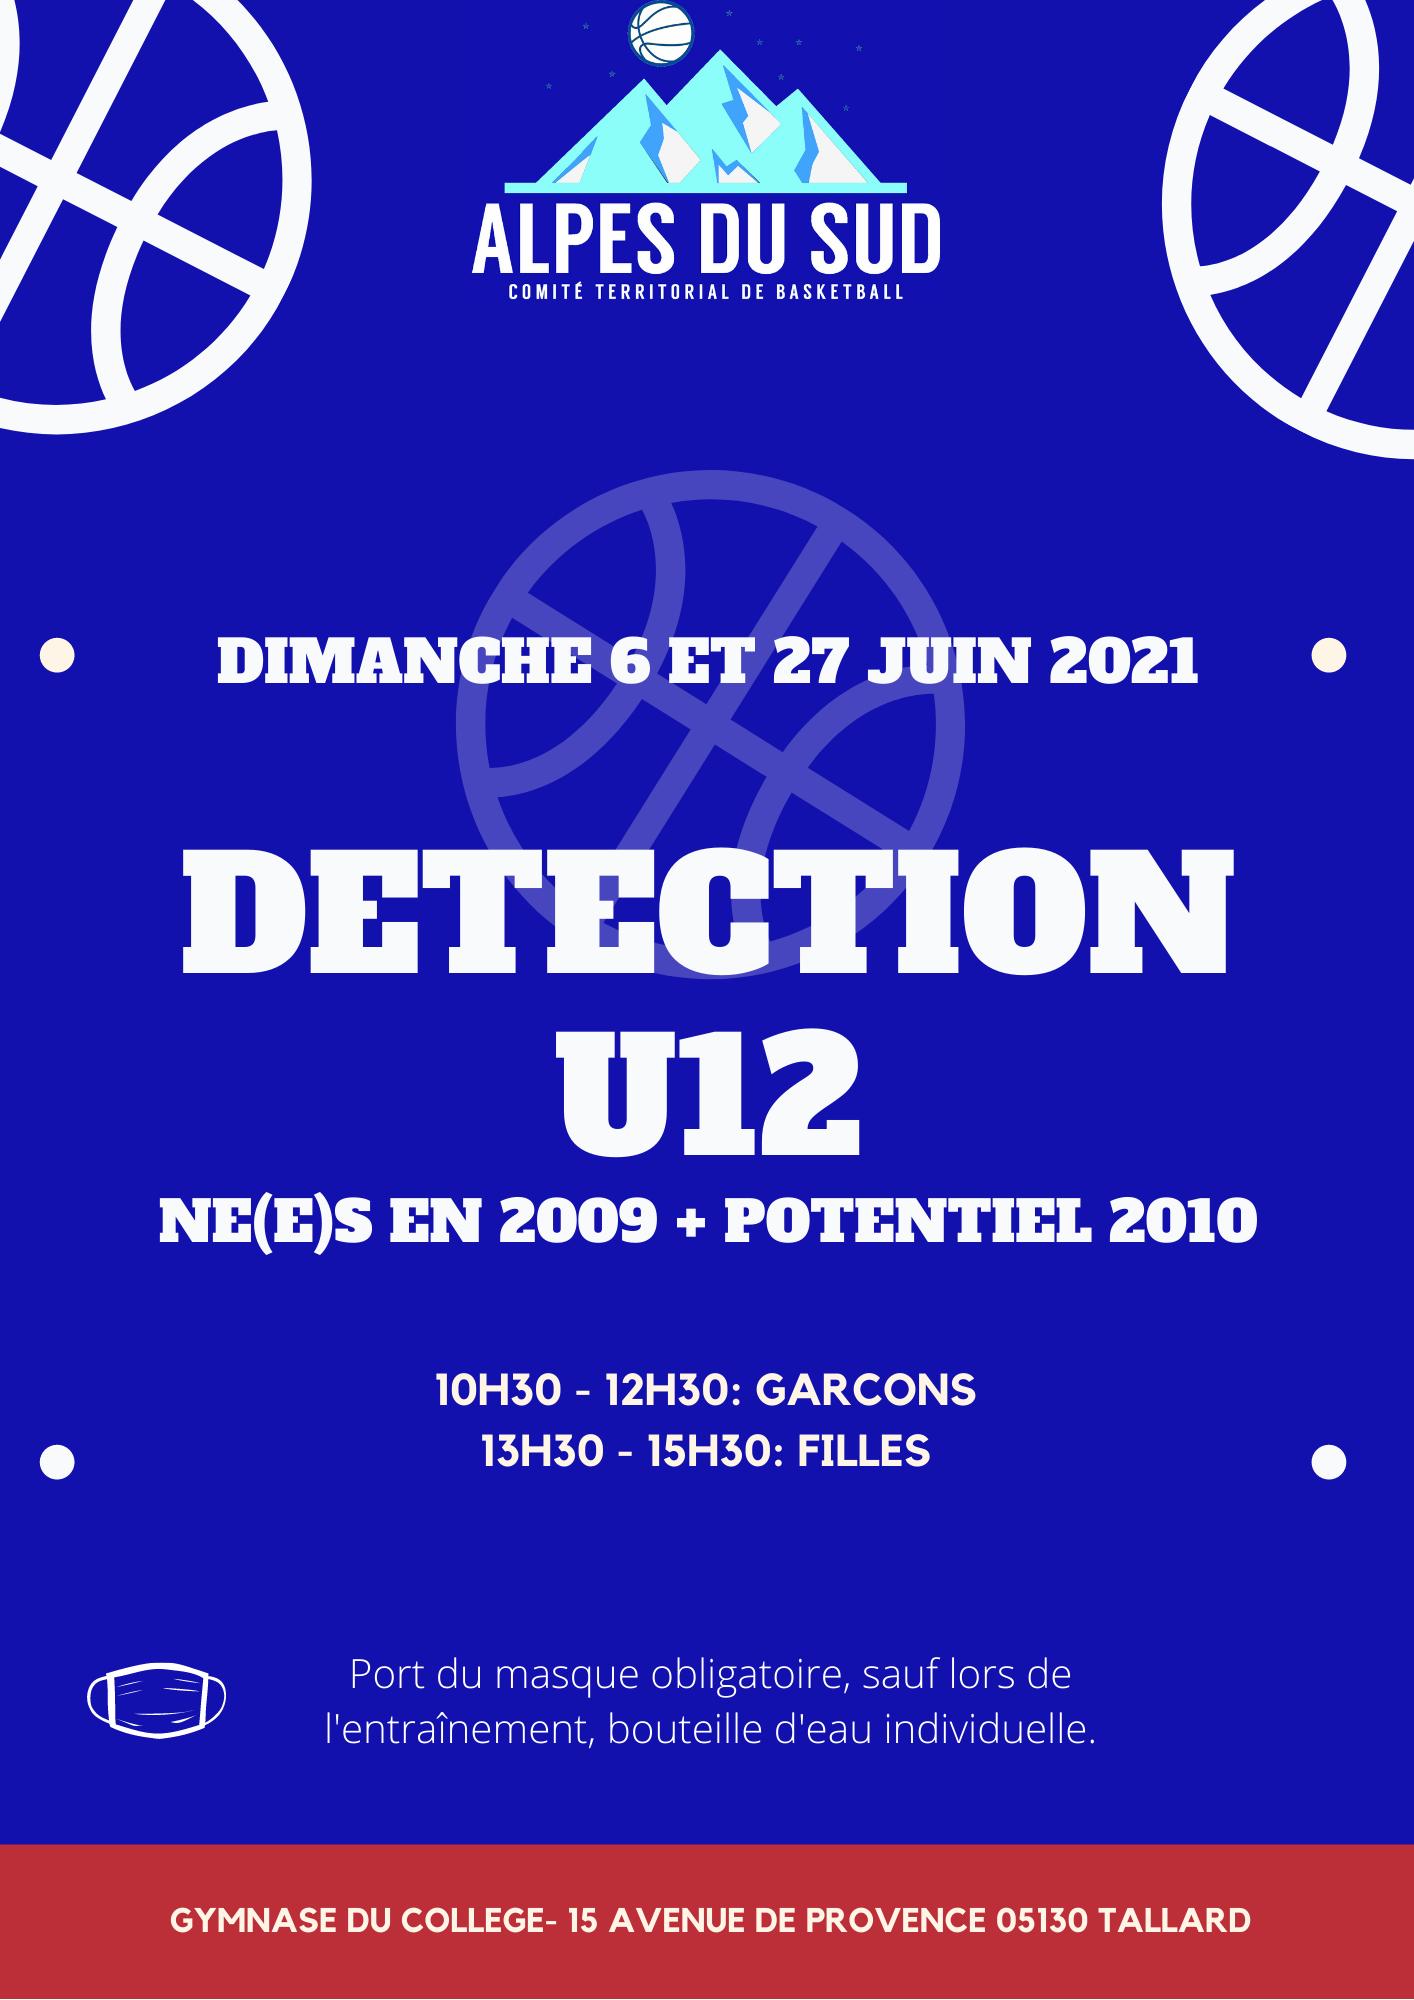 DETECTION U12 – U11